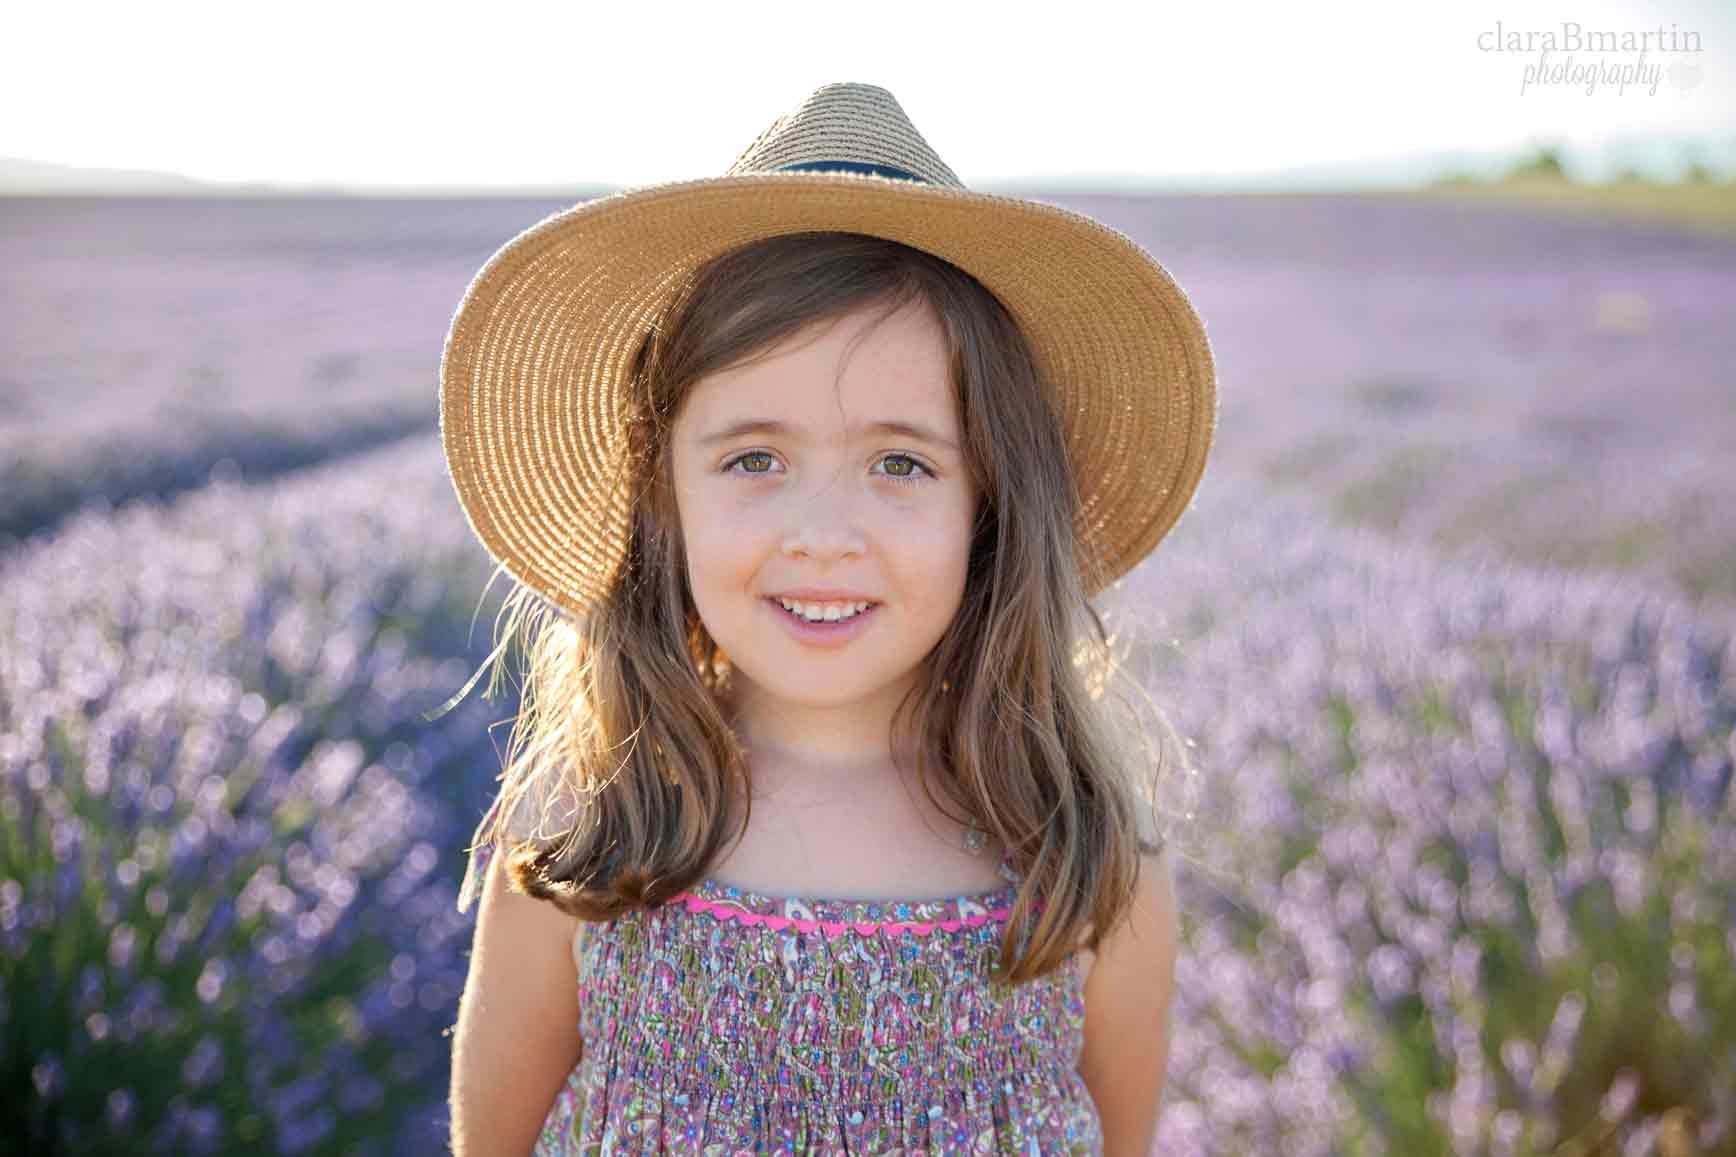 Lavender-fields-Provence-claraBmartin03